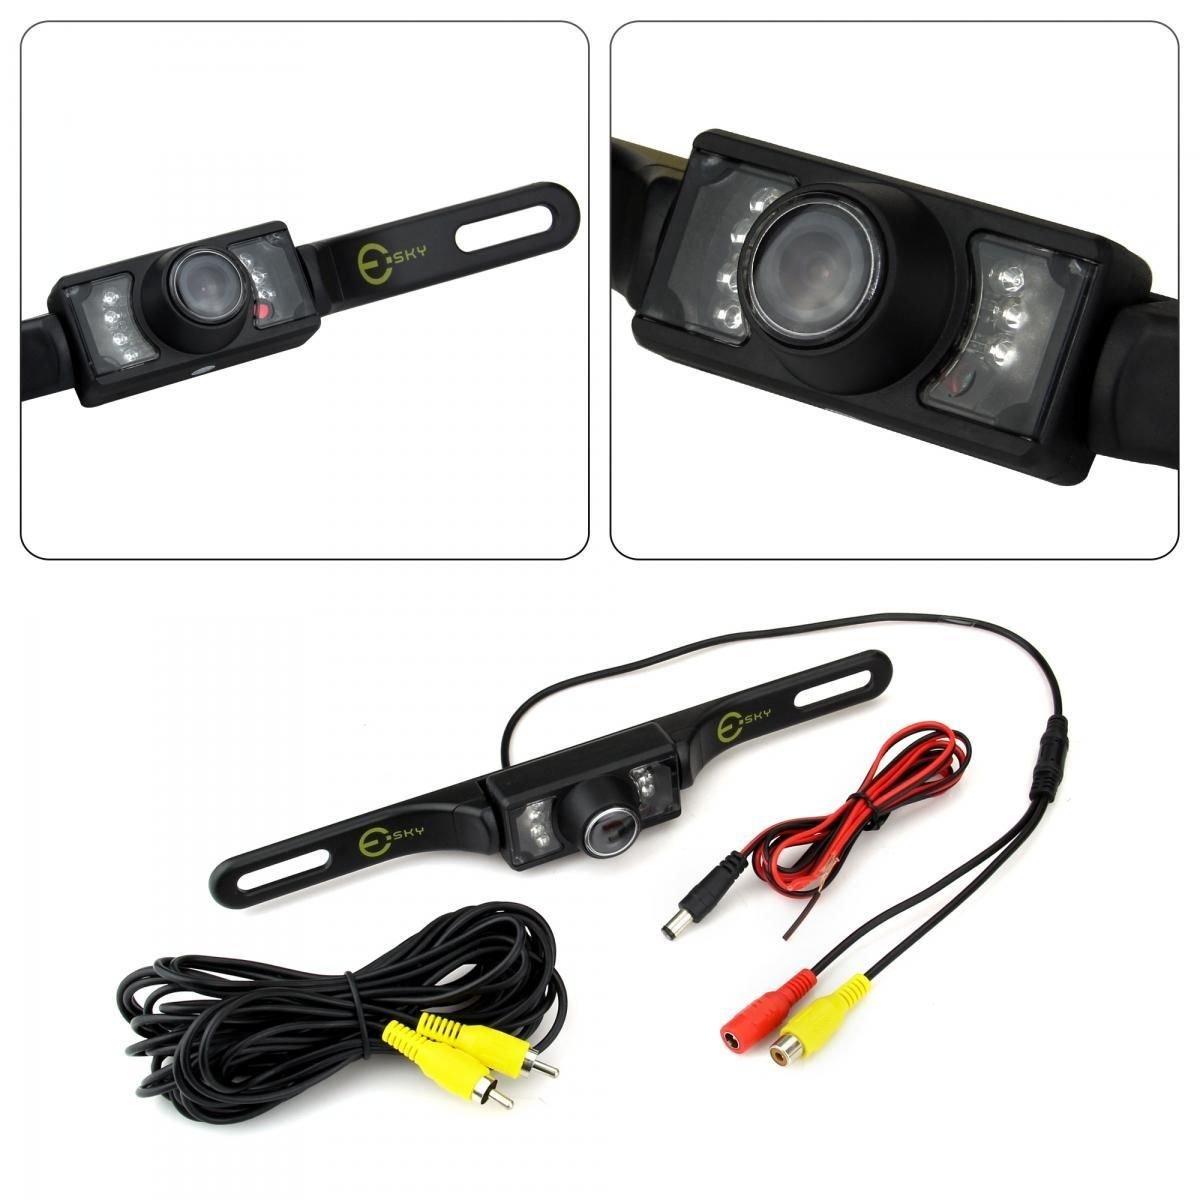 Universal CMOS Waterproof 7 LED Car Rear View Reverse Backup Parking Camera